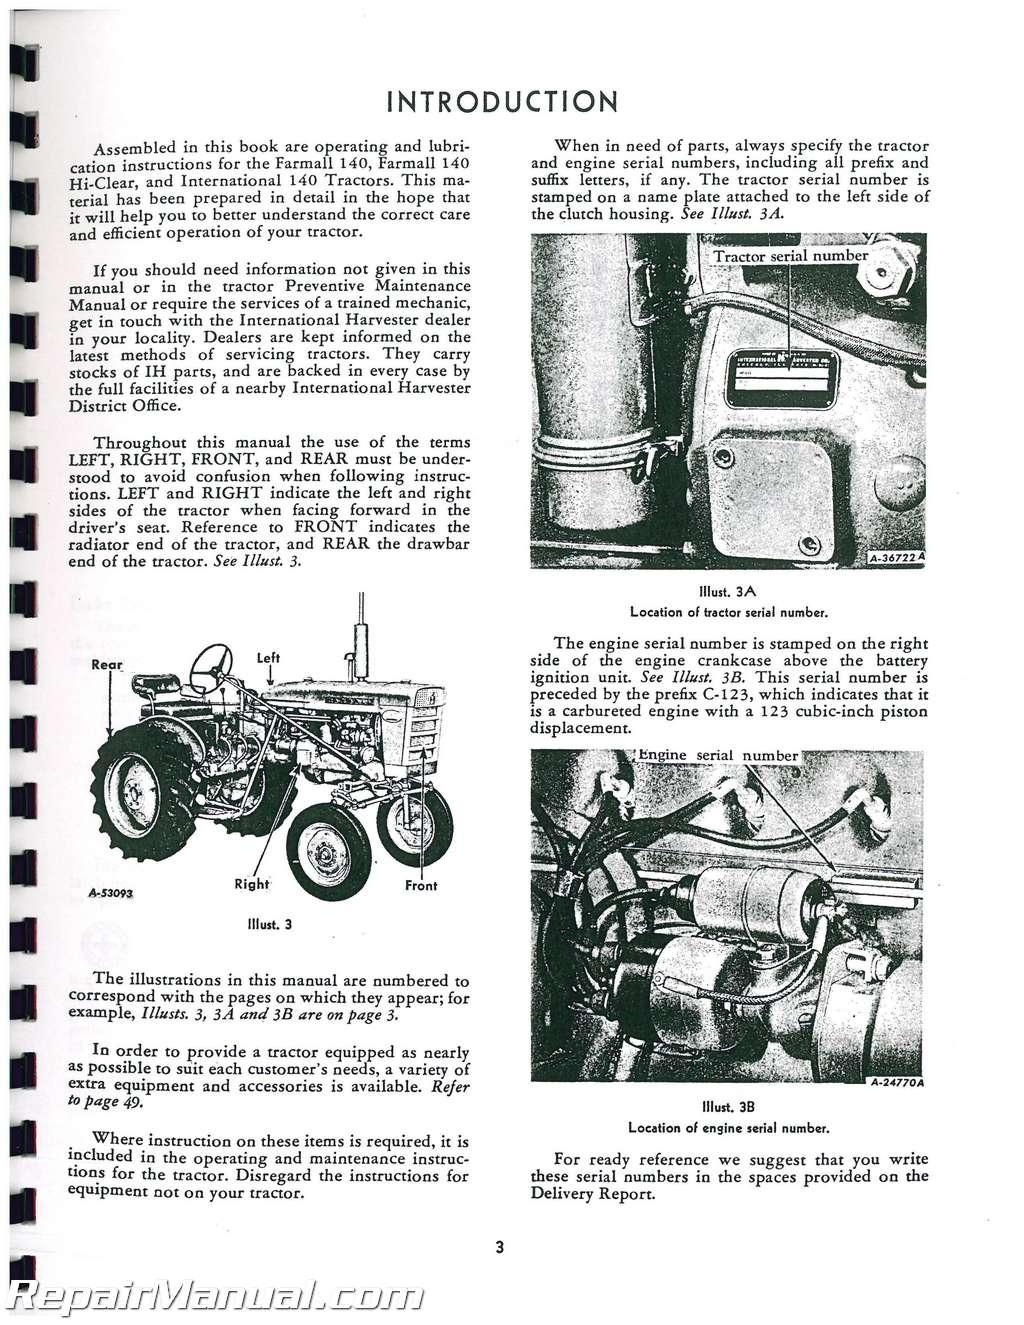 Ih Parts Manual